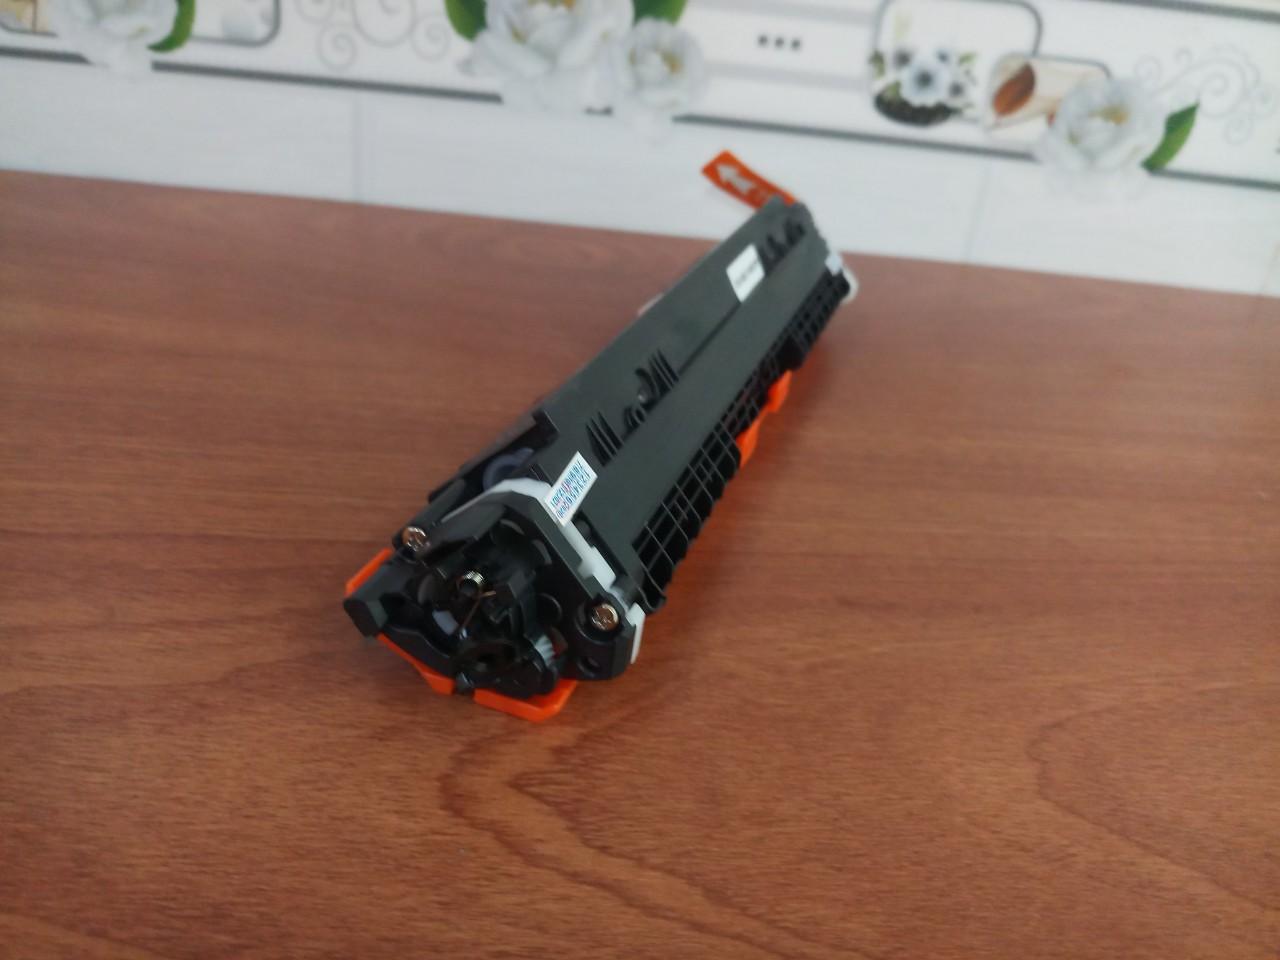 Hộp mực in màu dùng cho máy Canon LBP 7010C, LBP 7018C, HP CP1025, 1025NW, MFP M175A, M275, M176N, M177FW - bộ mực HP 130A, HP 126A, Canon 329 - Torner laser color